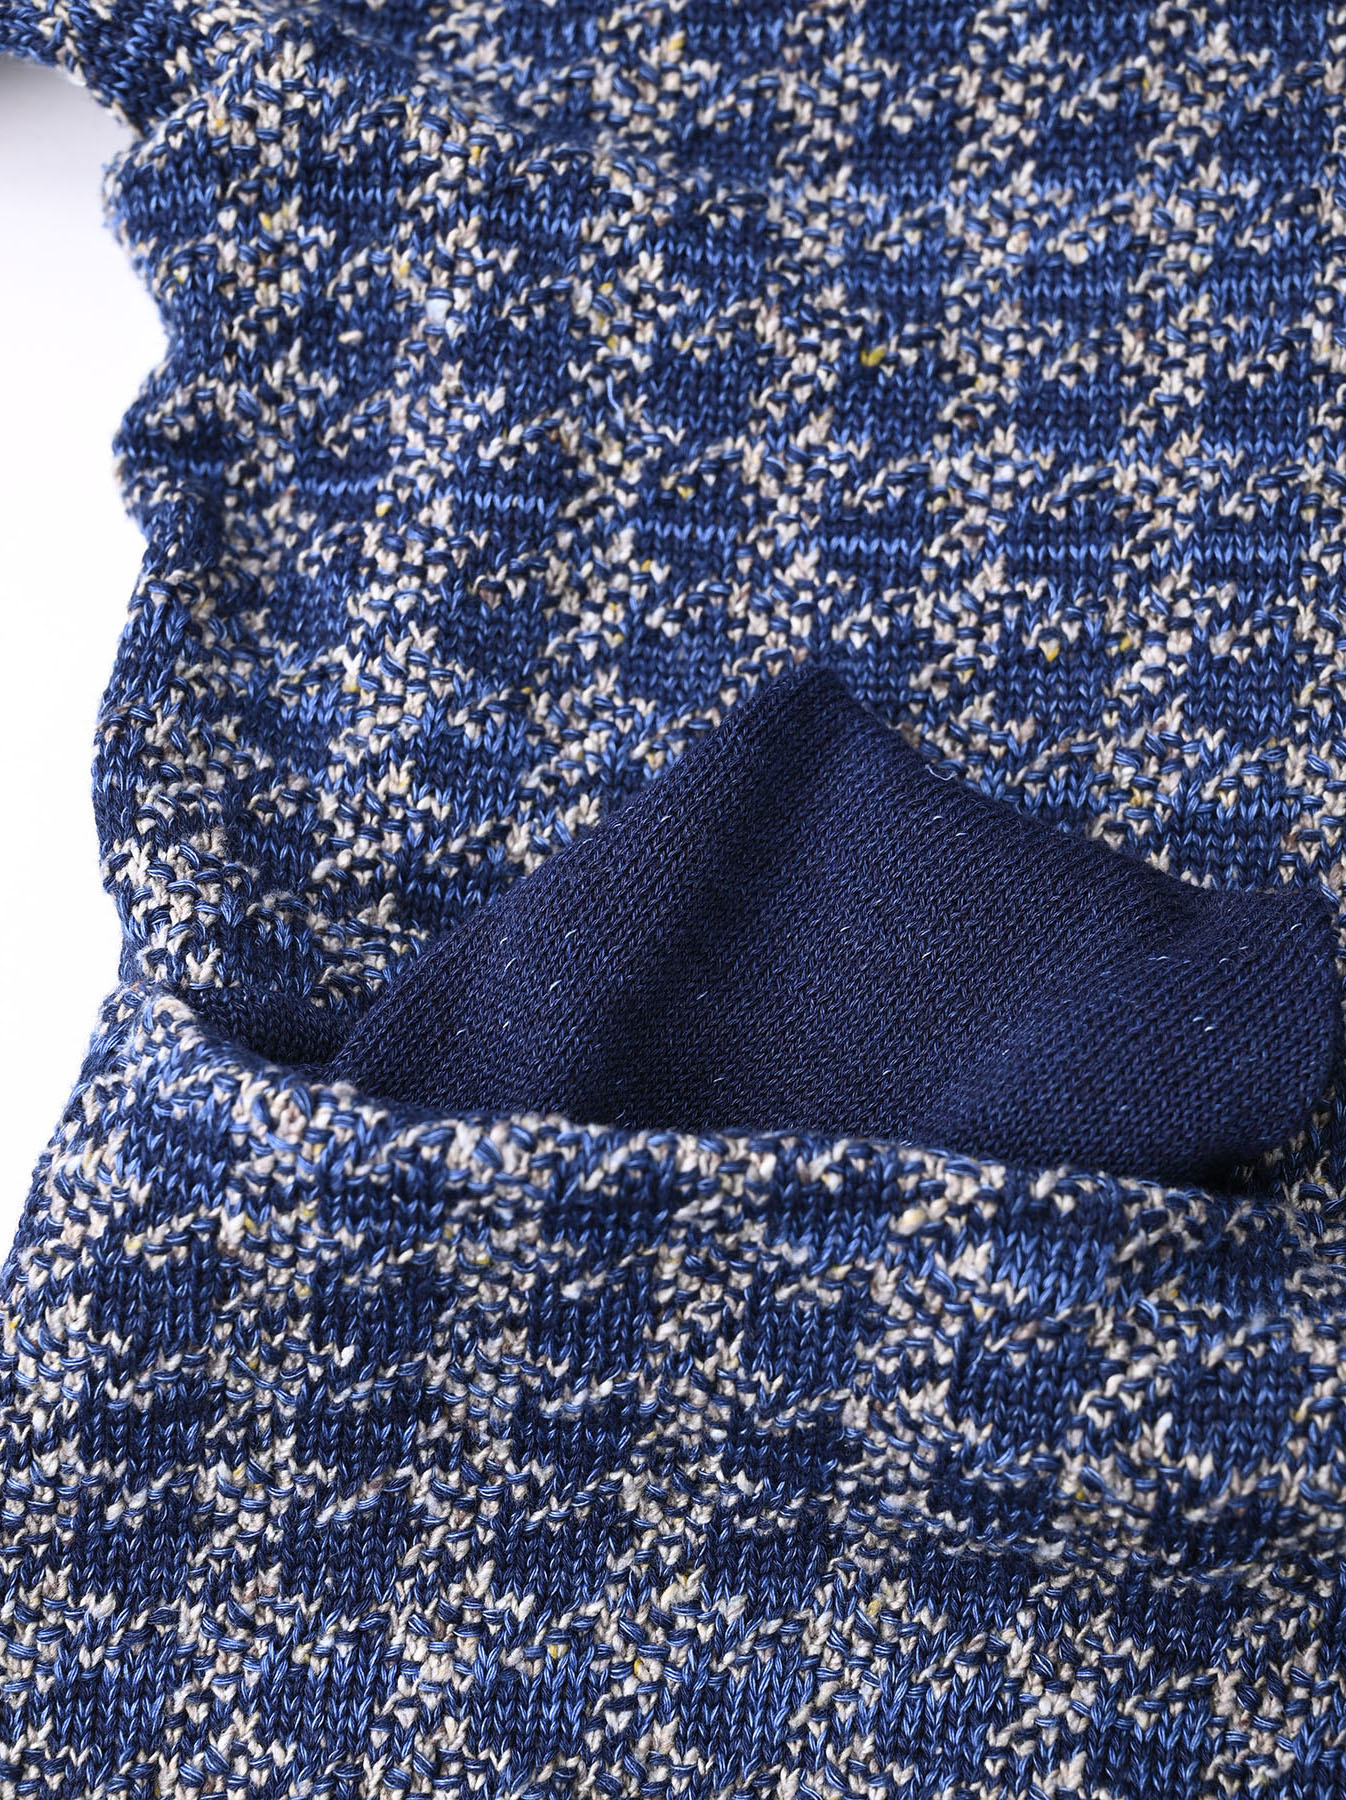 Indigo Knit Jacquard 908 Umahiko Sweater-7